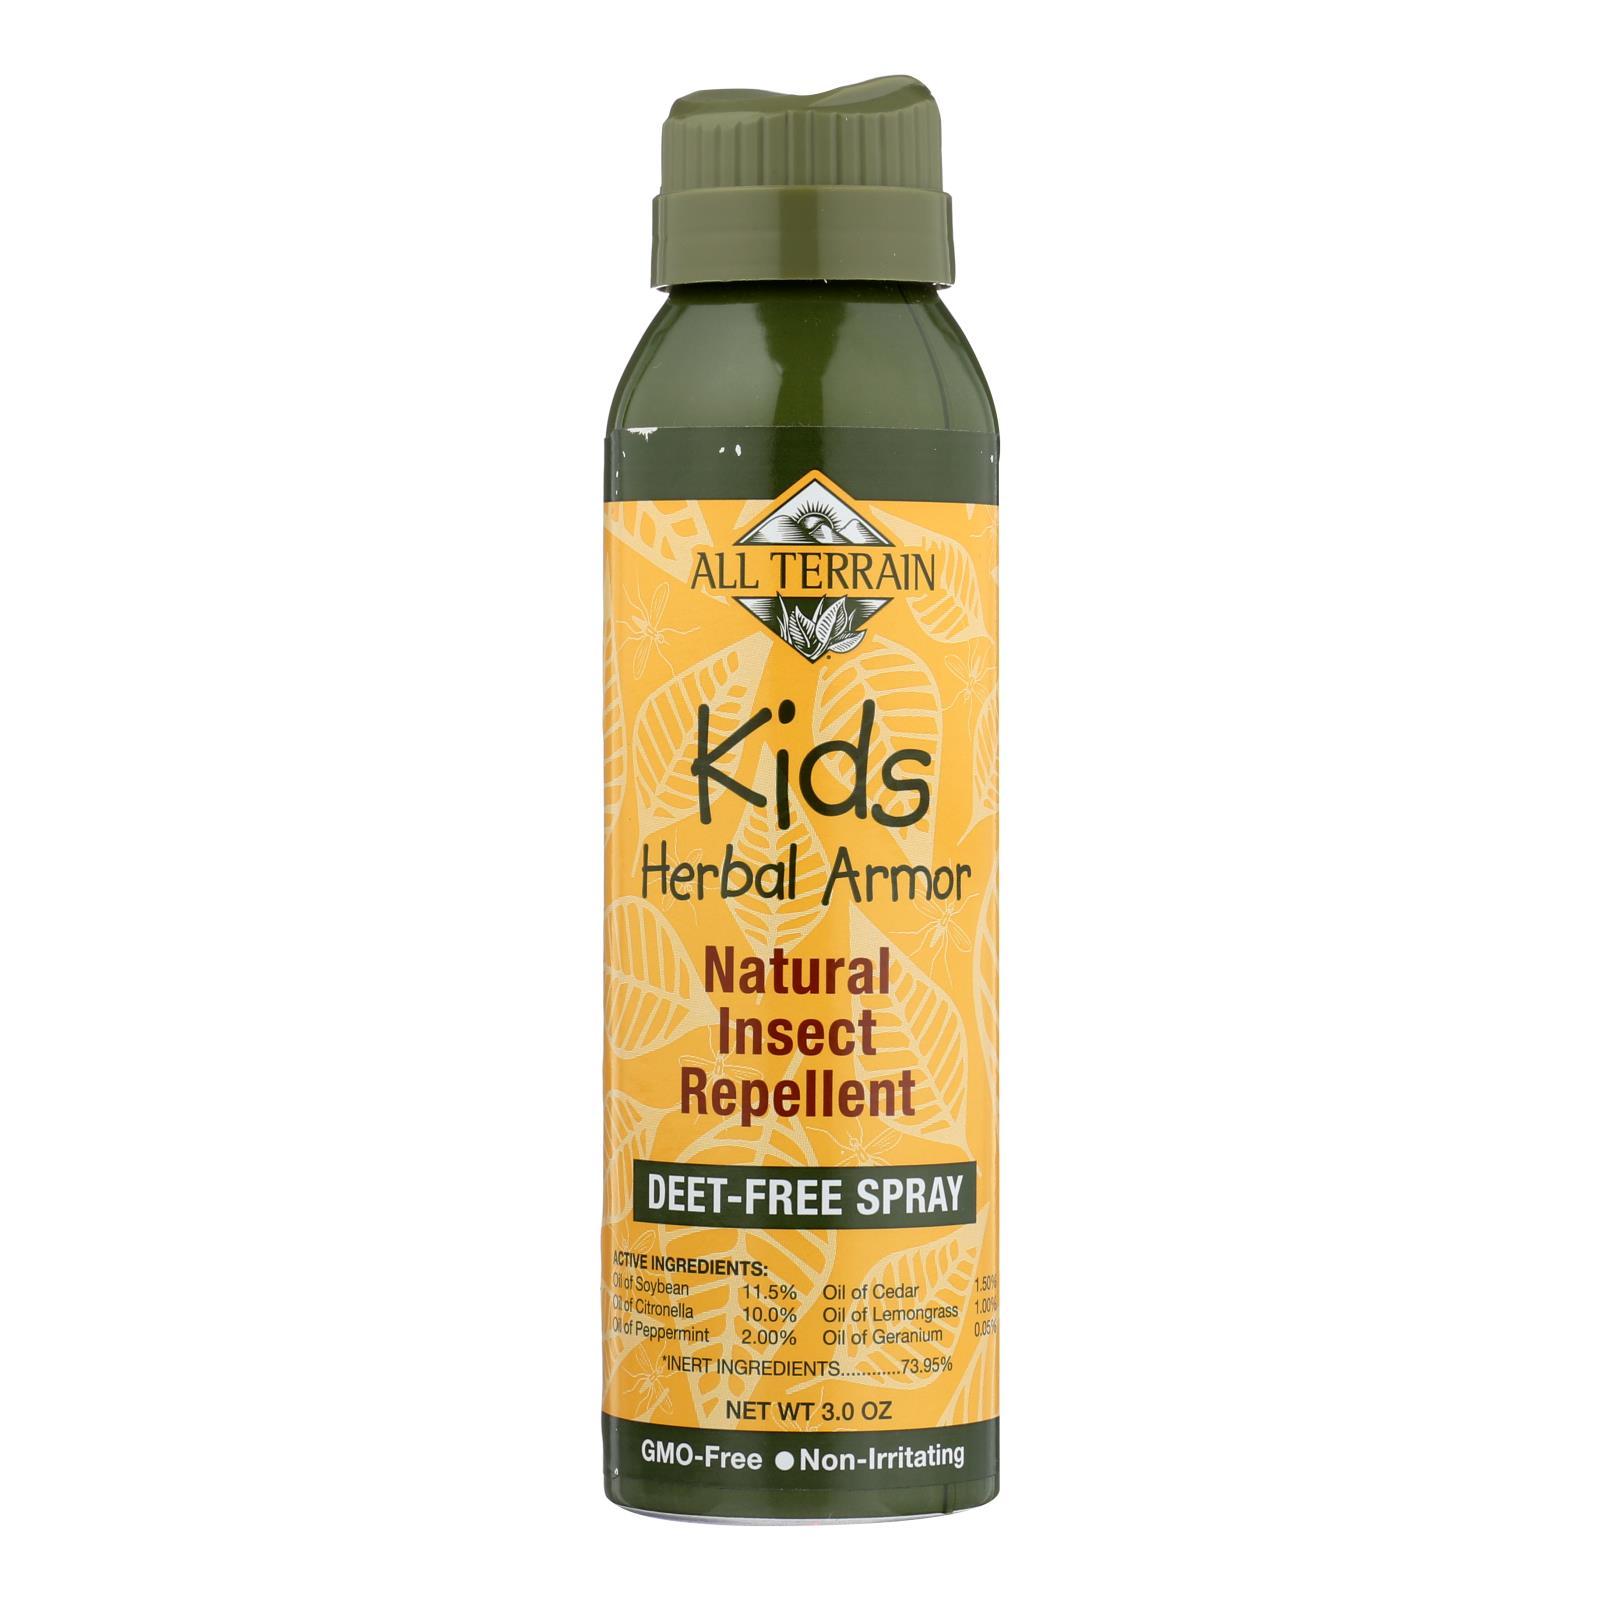 All Terrain Kids DEET-Free Herbal Armor Insect Repellent, 3